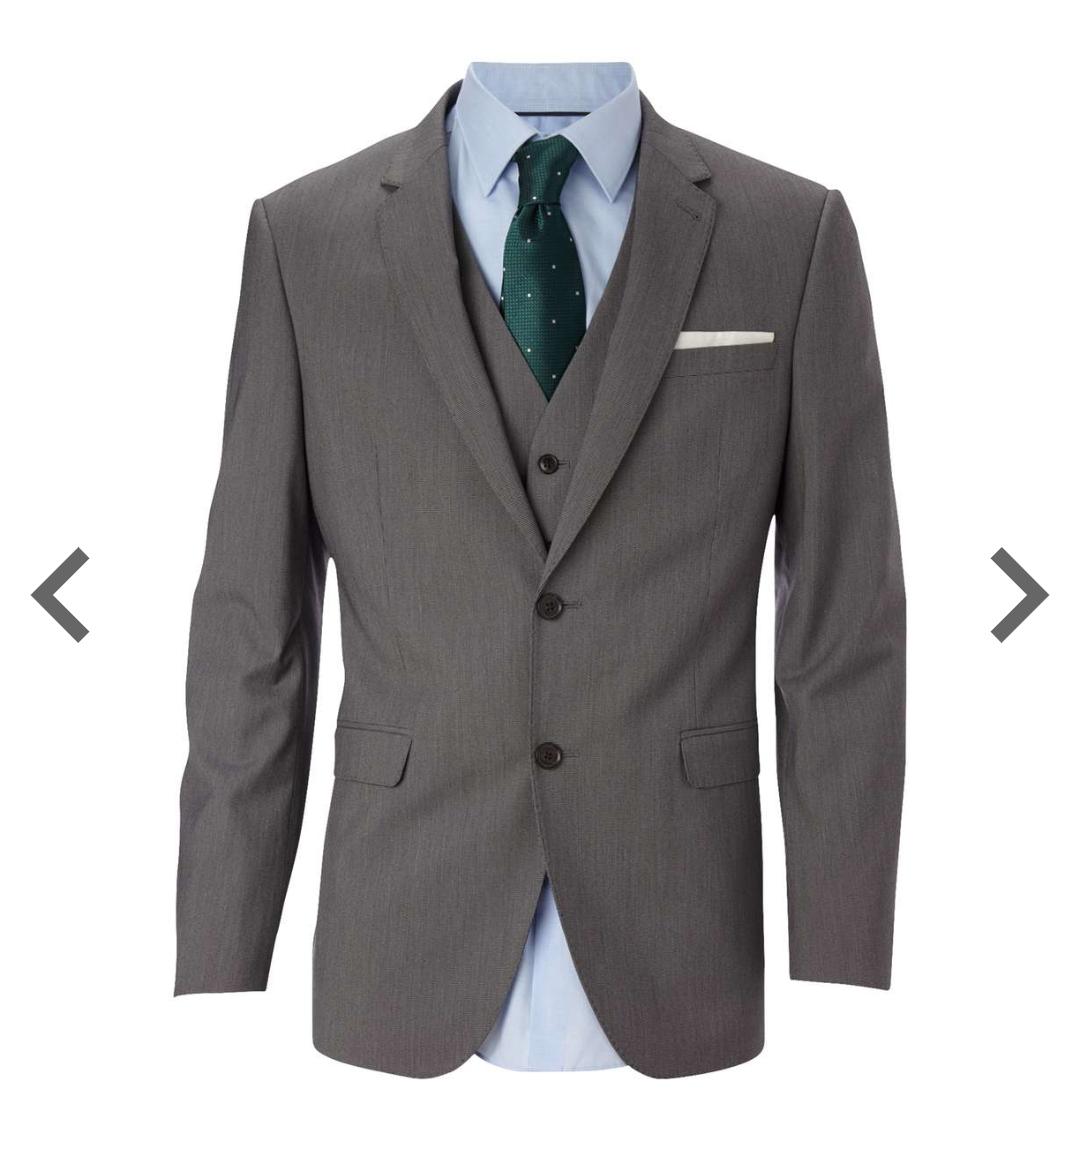 Gray tailored suit jacket Burton - £15.00 free c&c